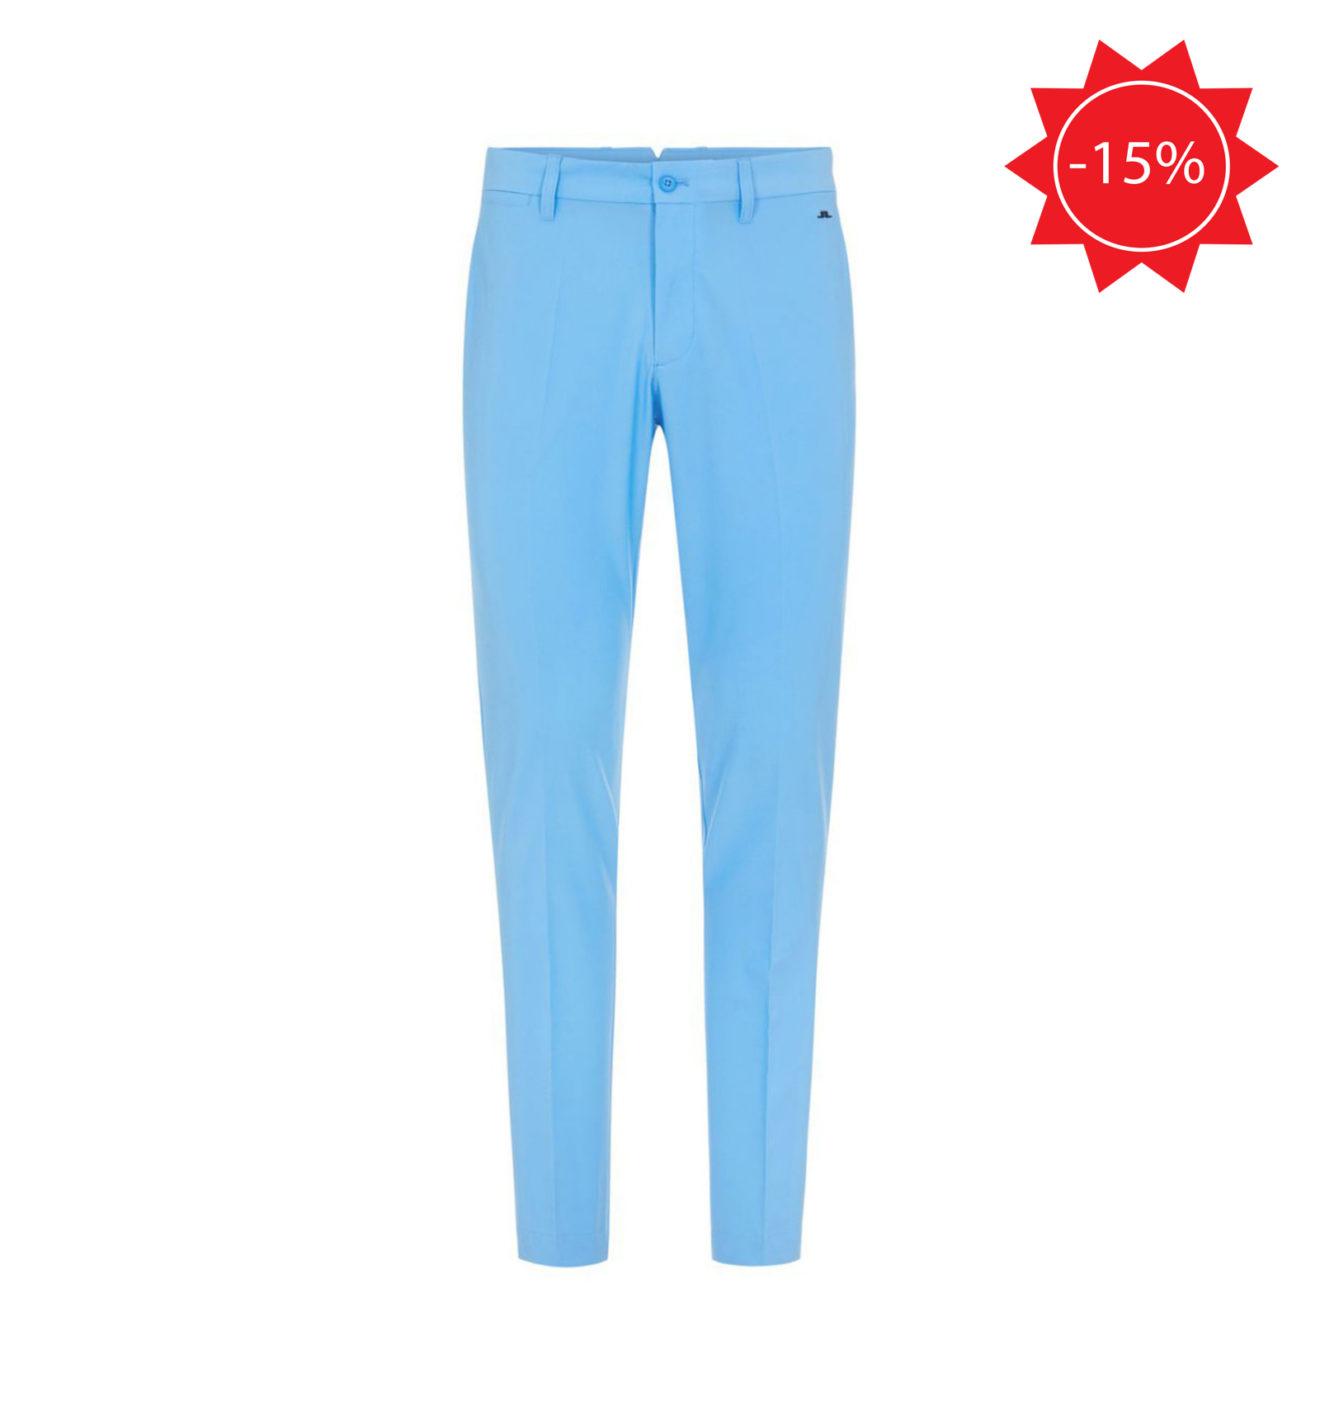 pantalon-jlindeberg-bleu-ciel